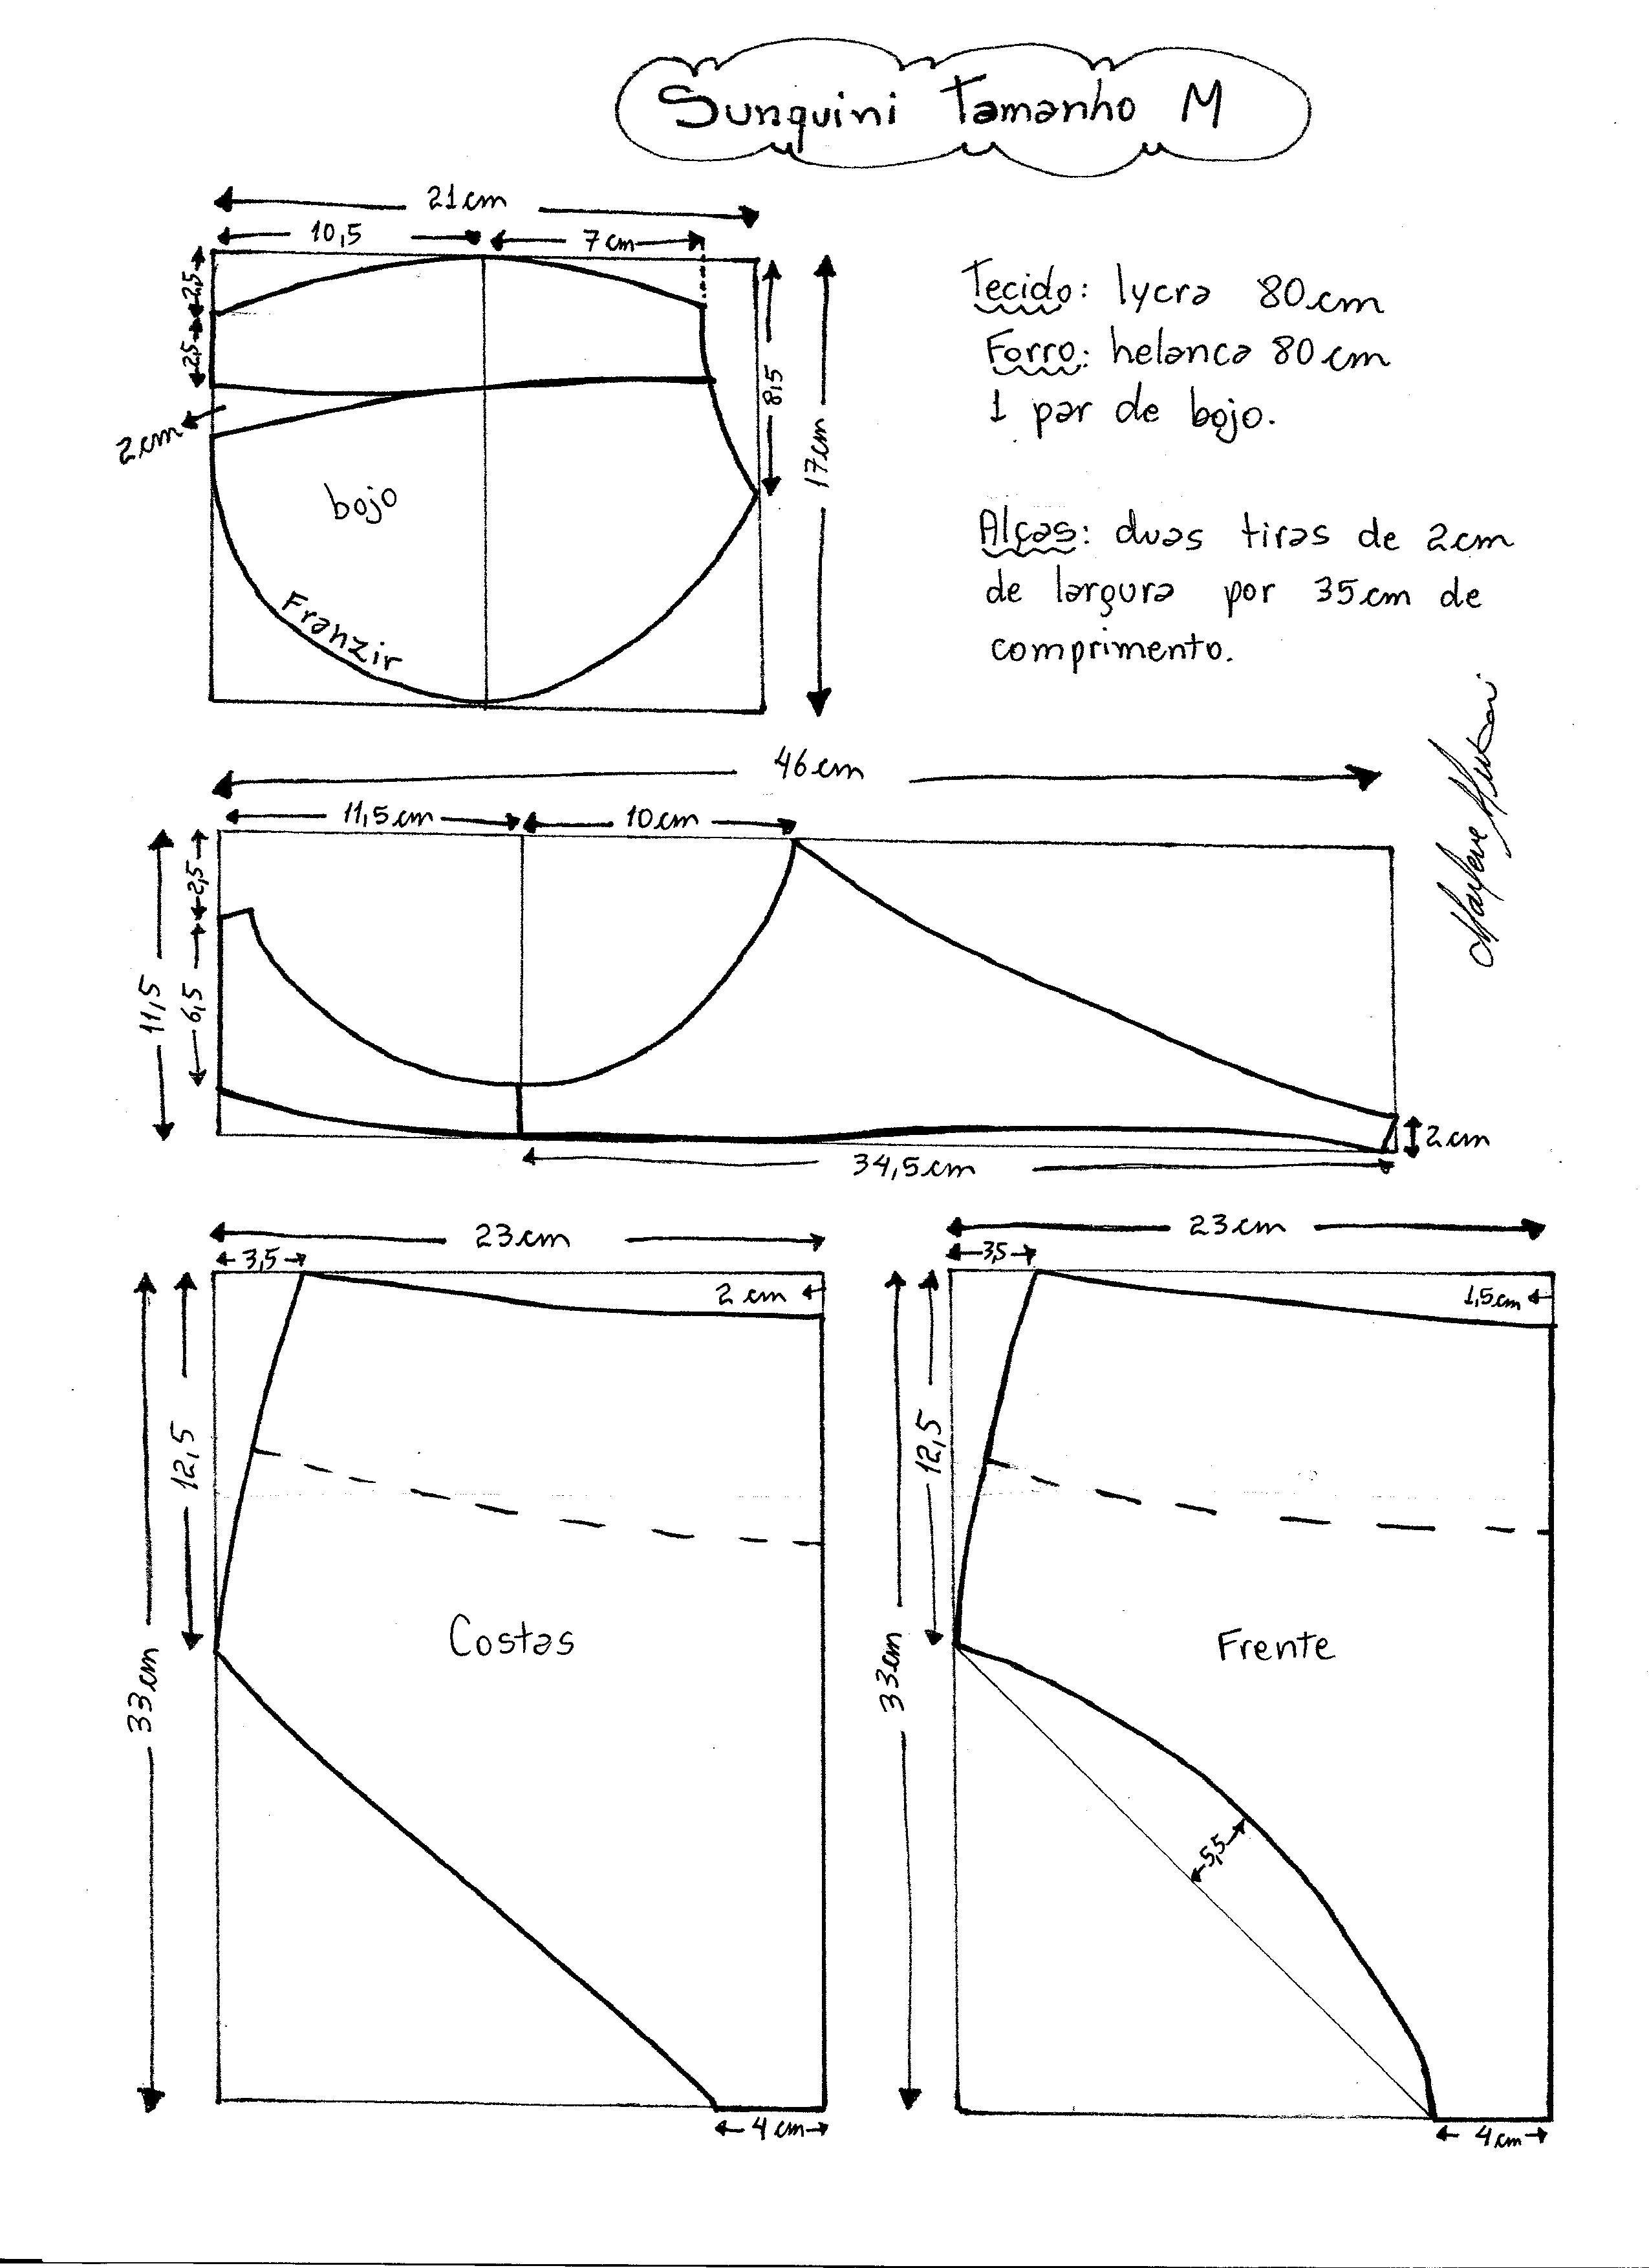 Biquini Retrô tipo Sunquini | Molde, Costura y Patrones